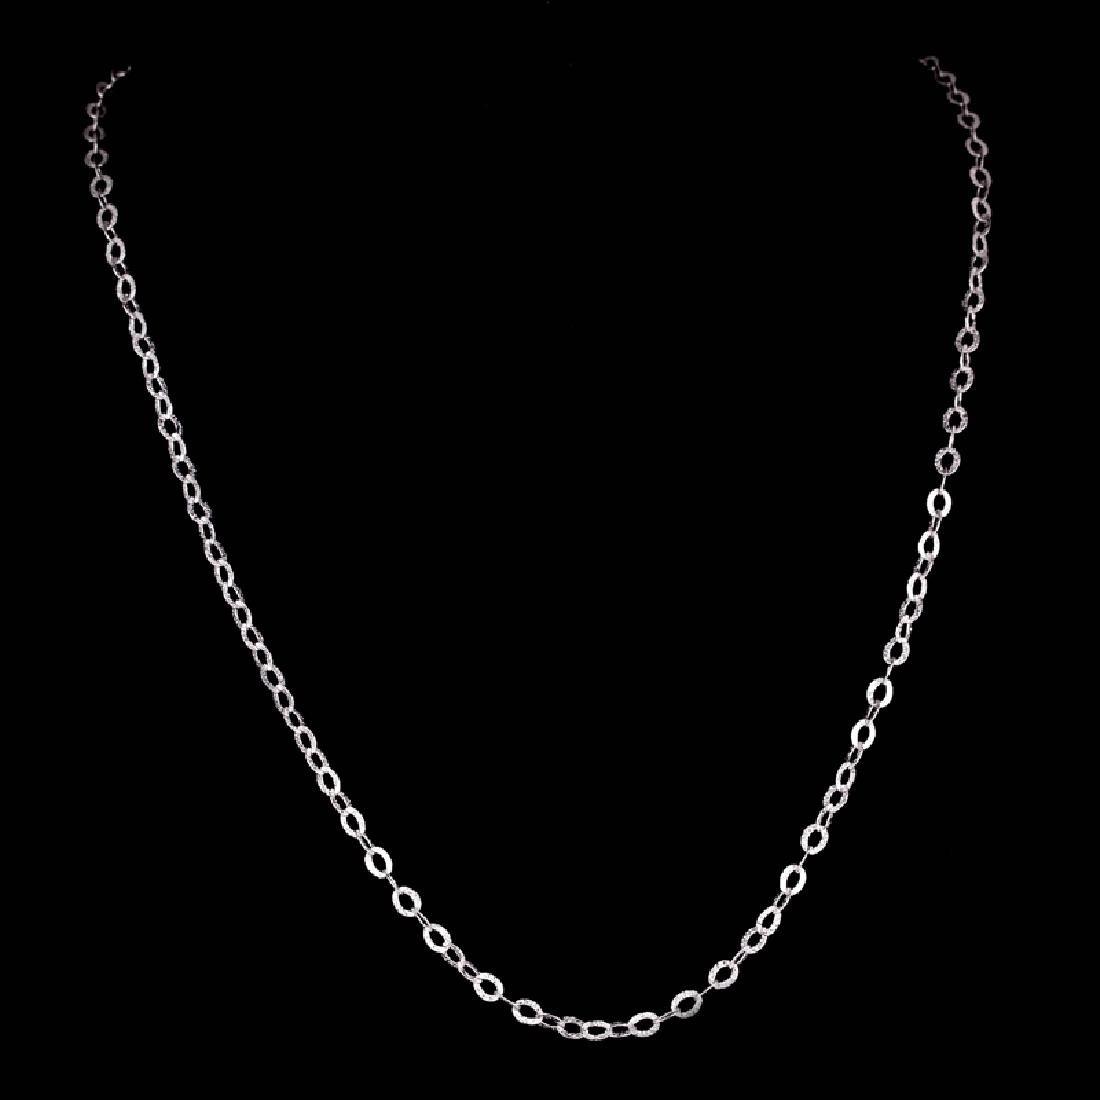 *Fine Jewelry 14KT White Gold, 3.3GR, 18'' Corrugated